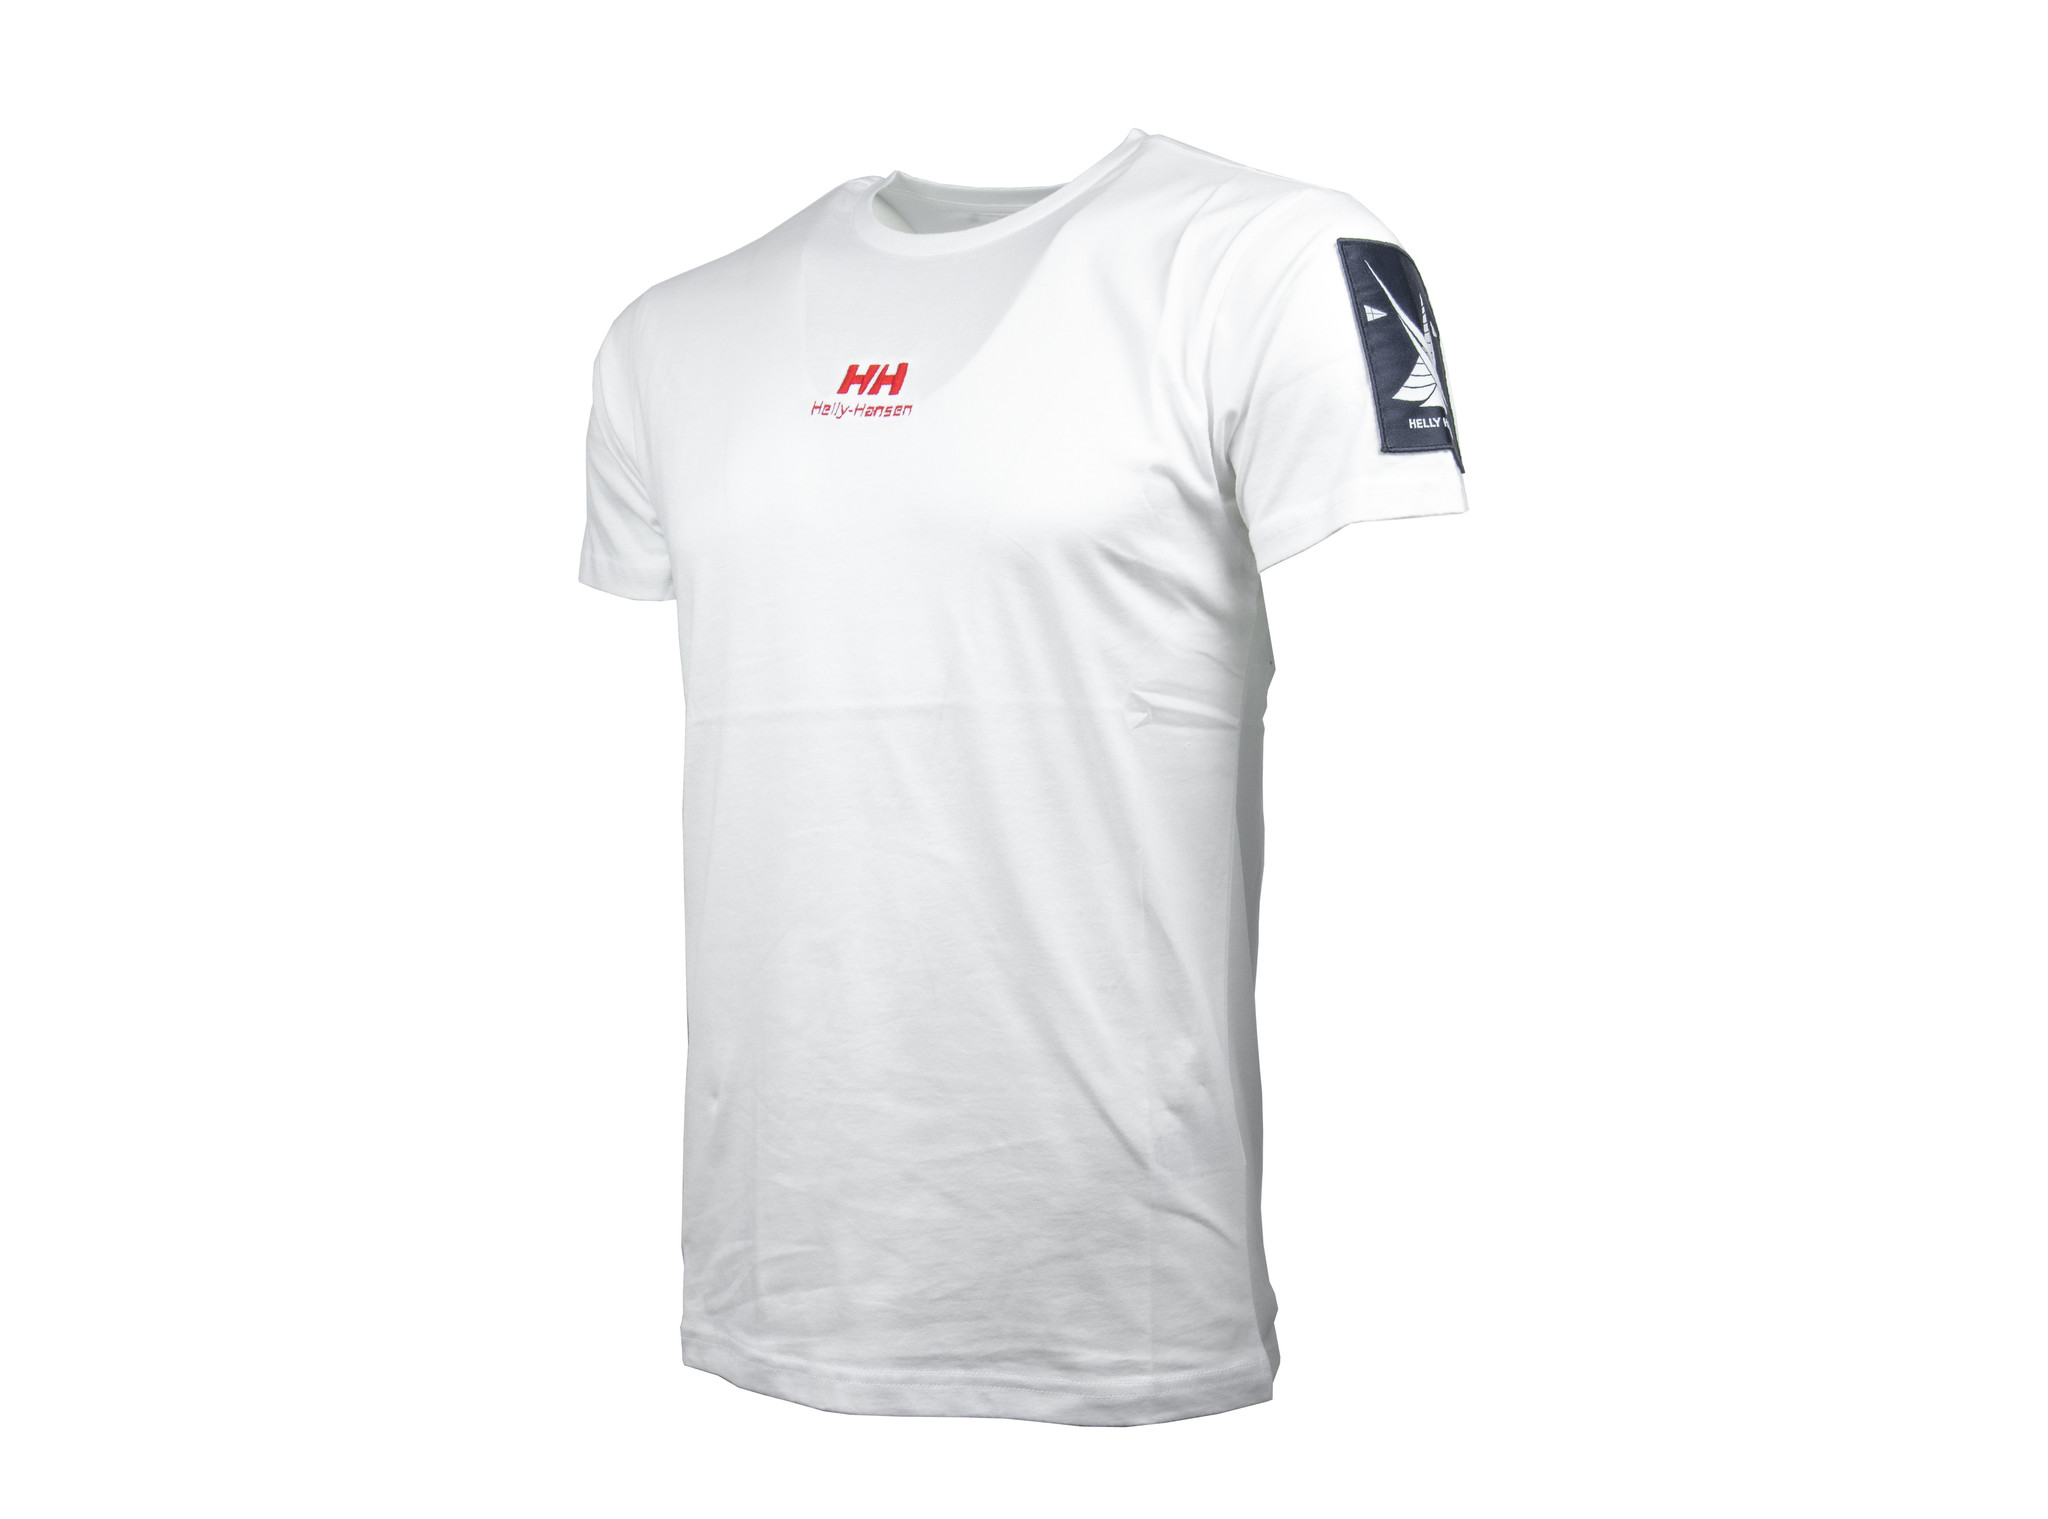 Urban T Shirt 2.0 White 29851 001